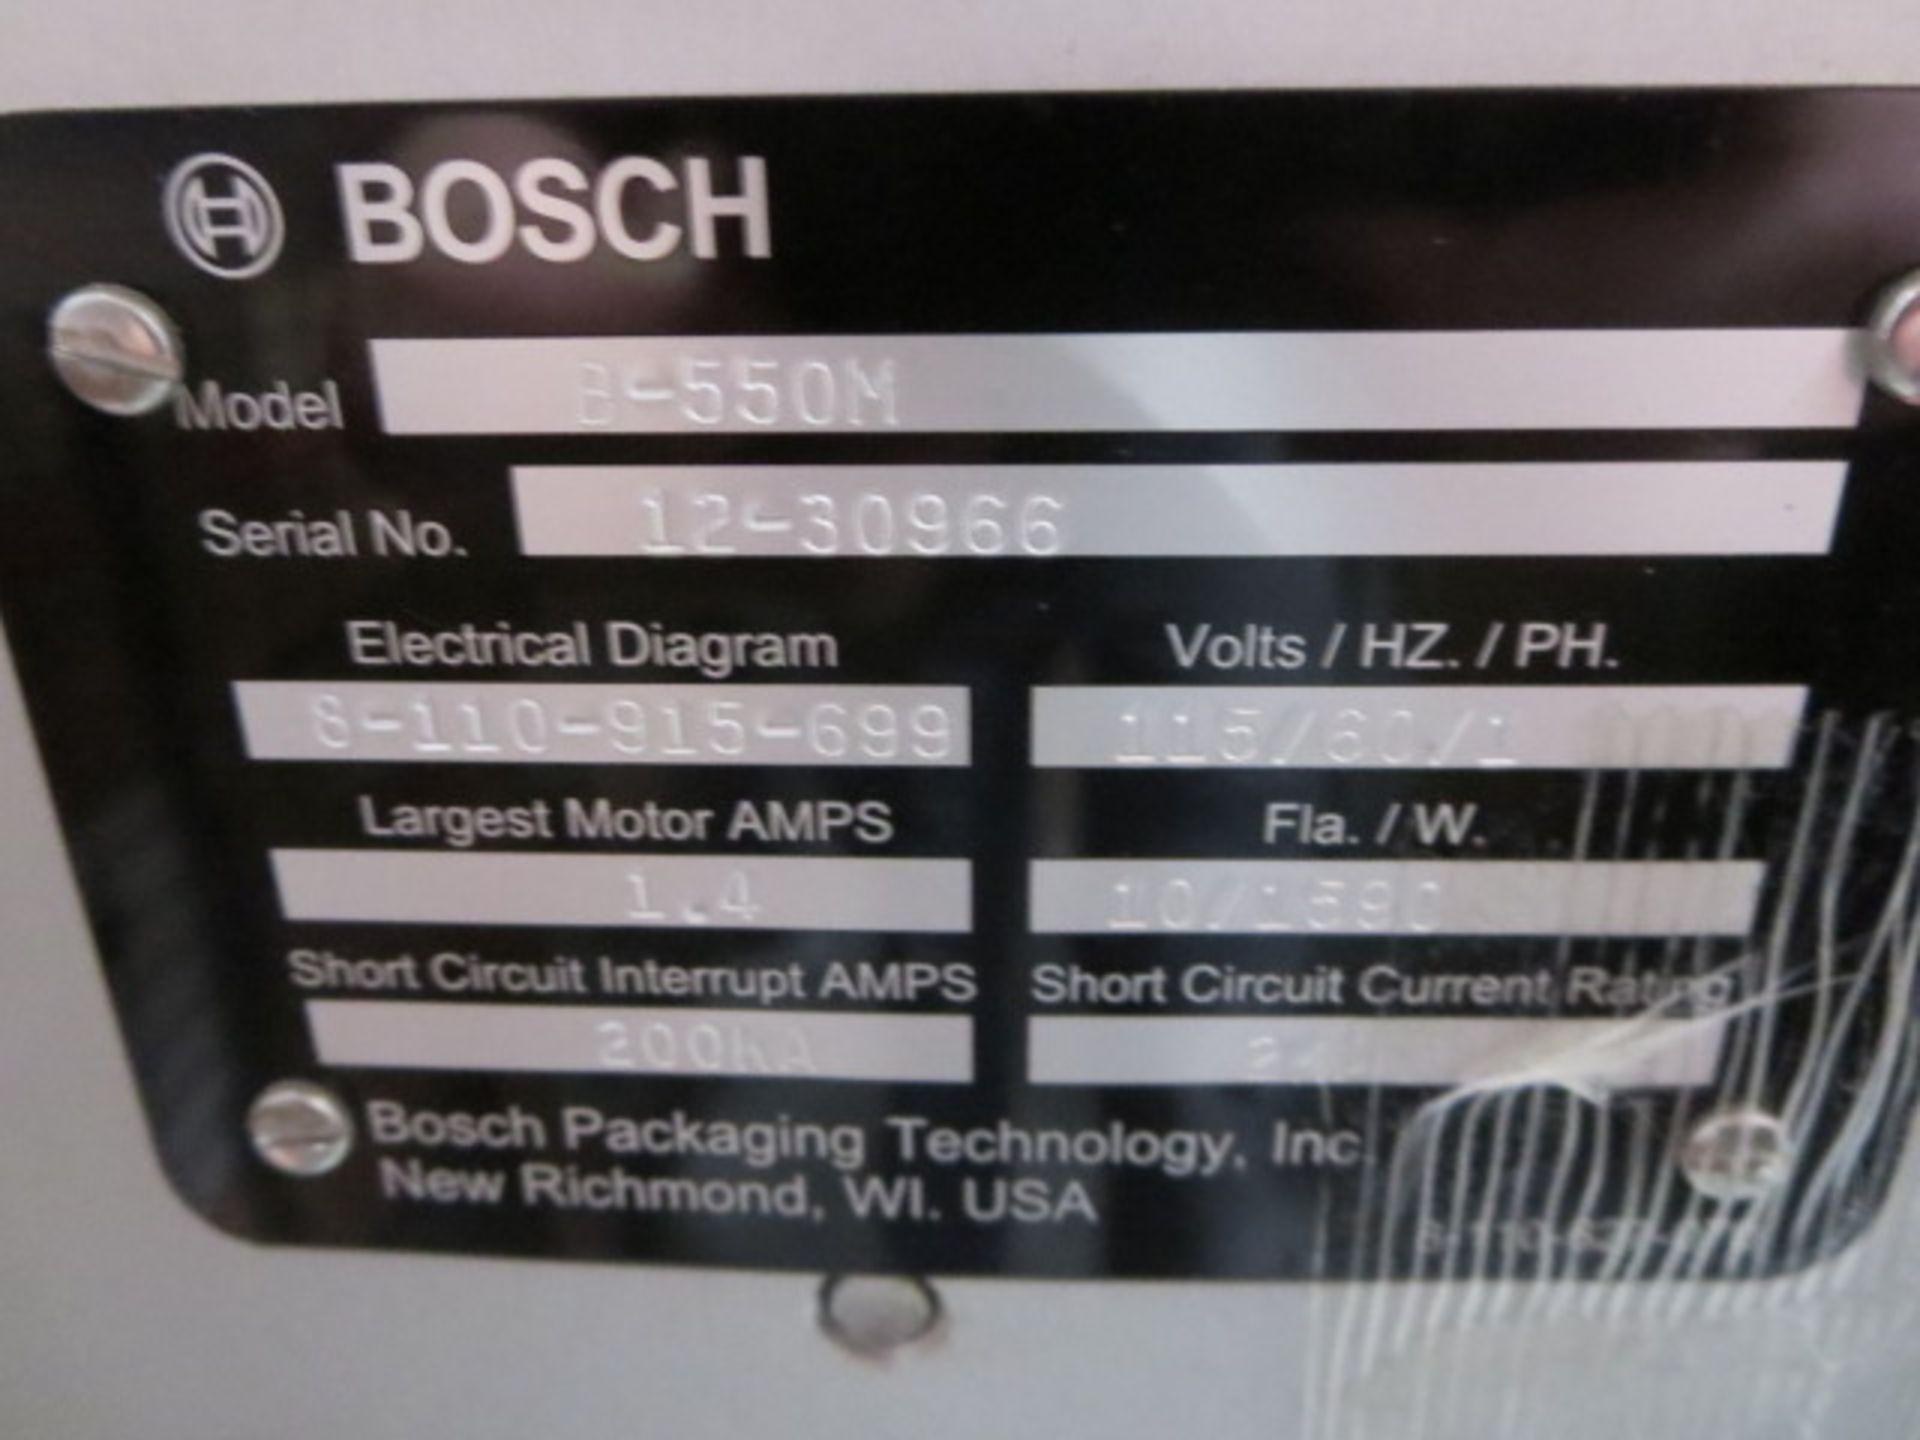 Lot 344 - Bosch Doboy Band Sealer, model B-550M